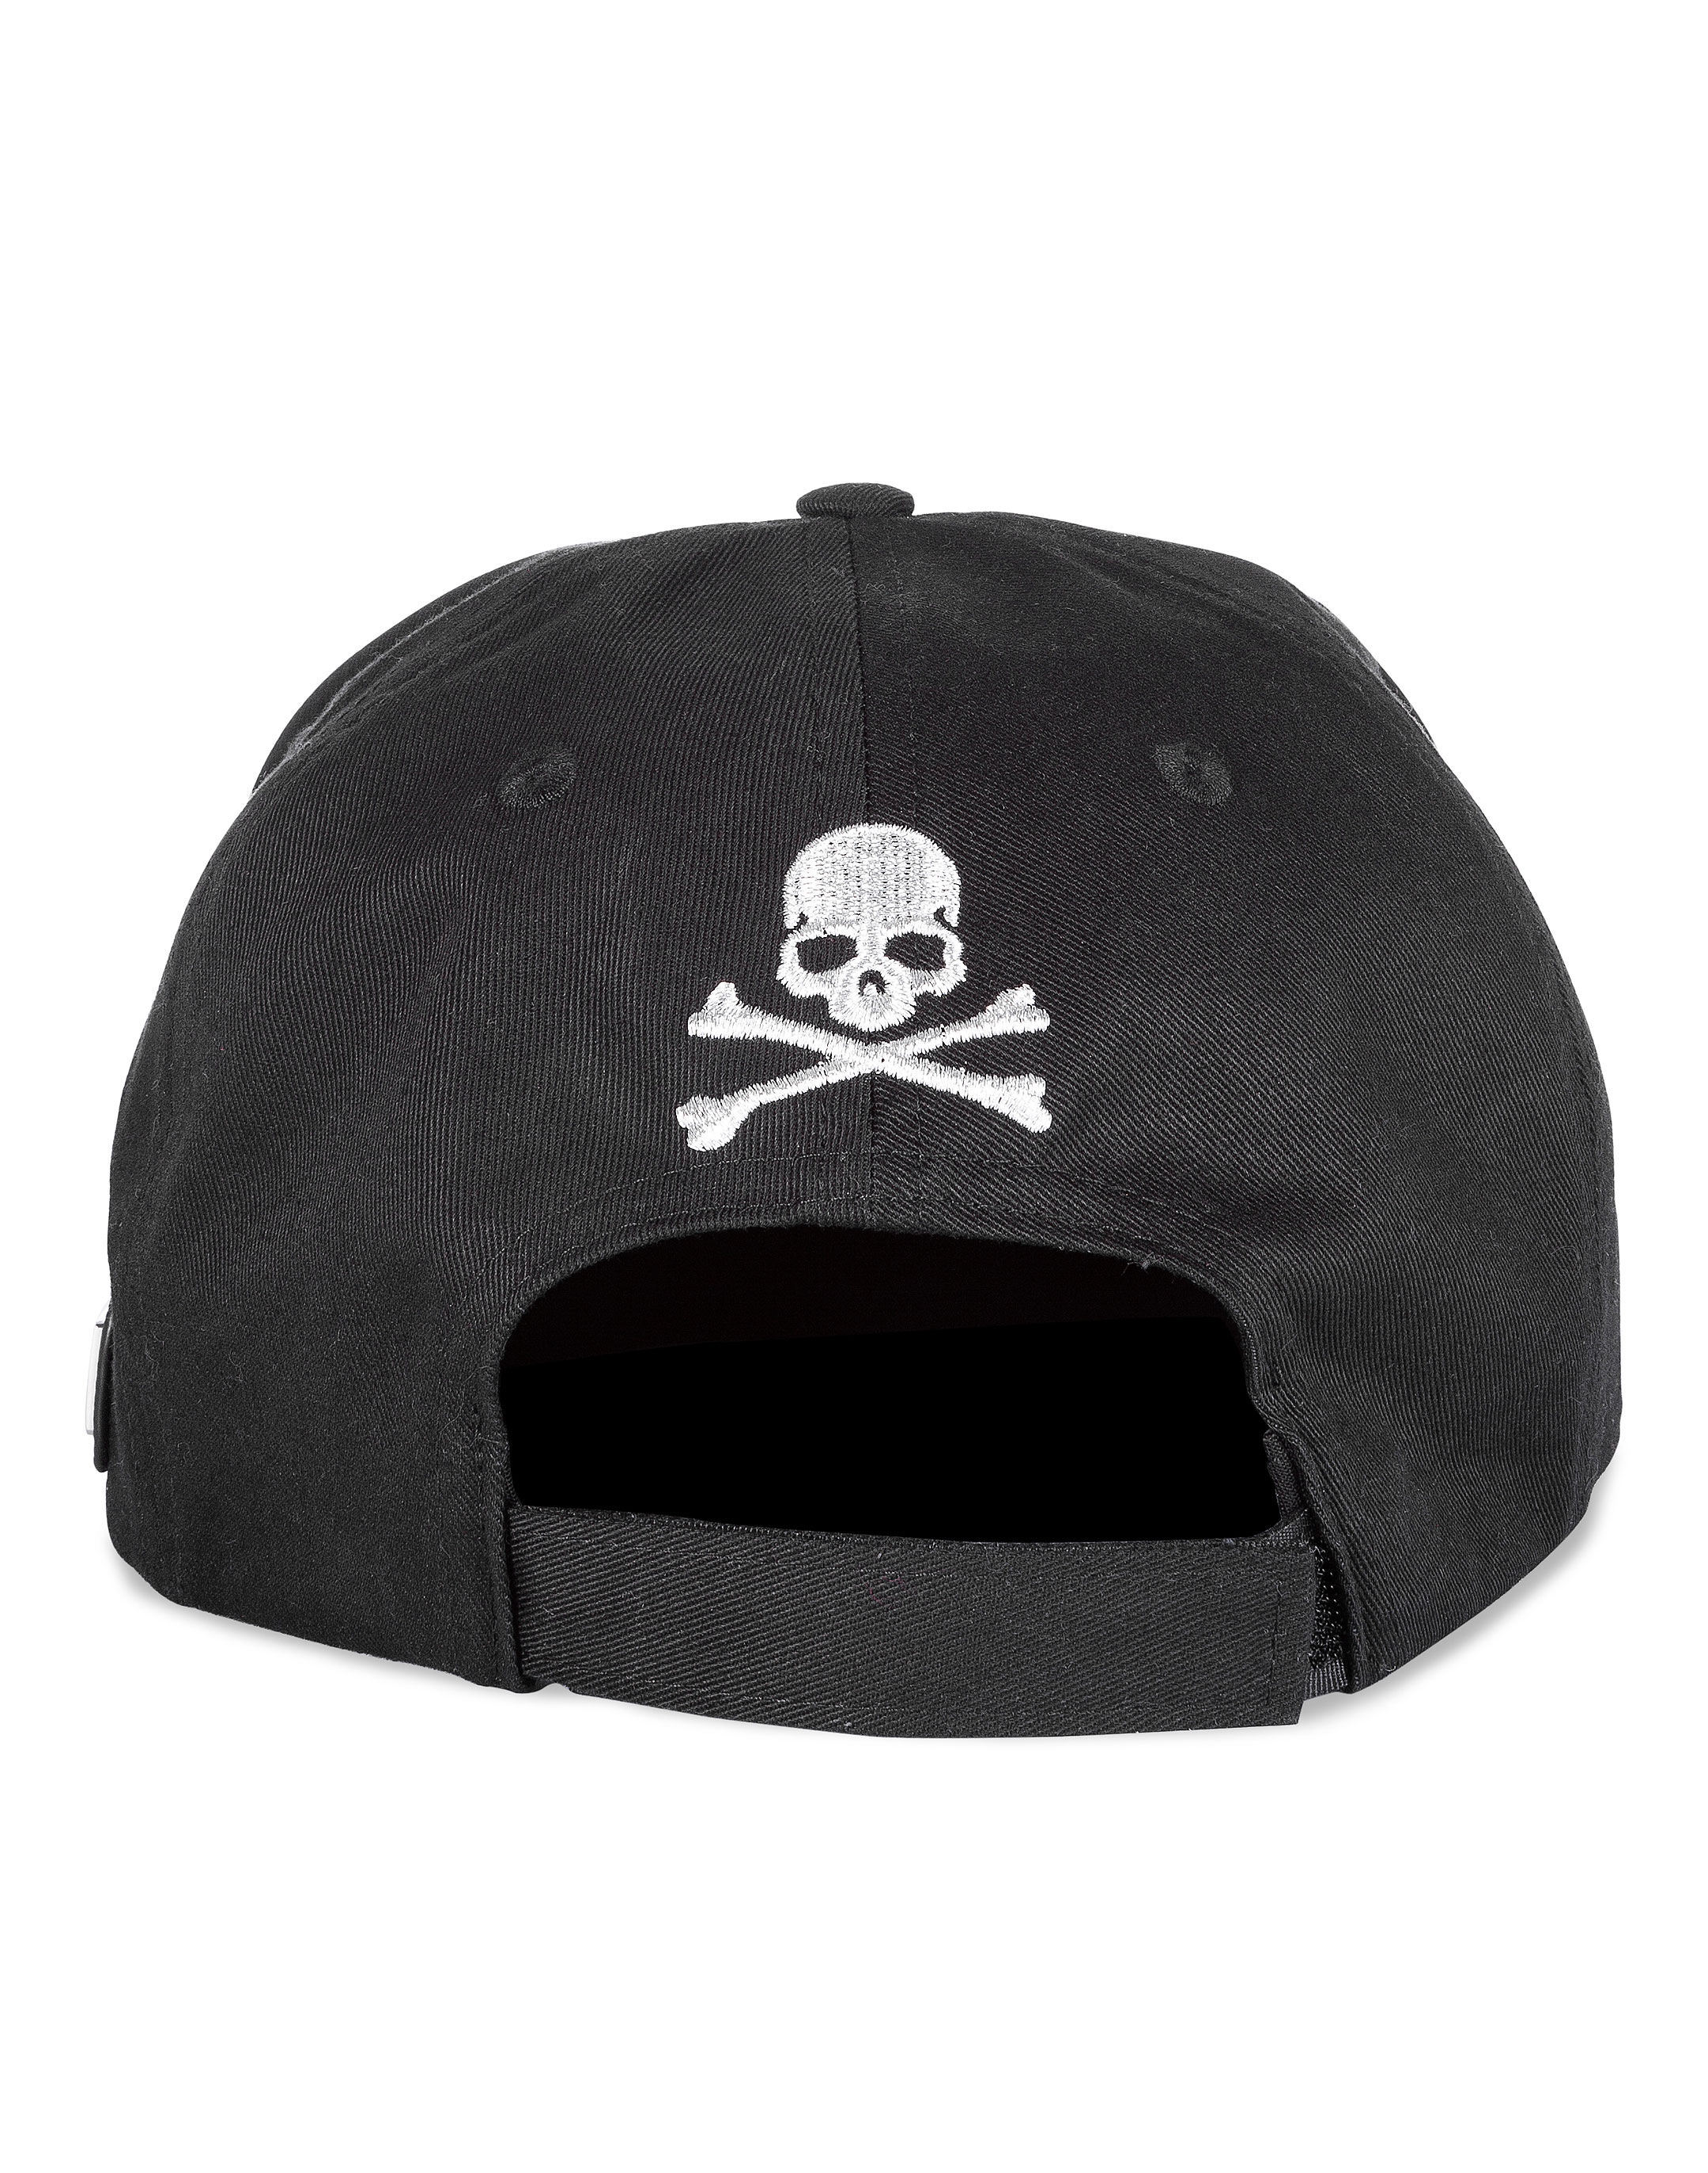 Acquista cappelli invernali jordan - OFF56% sconti 557ffab0f040